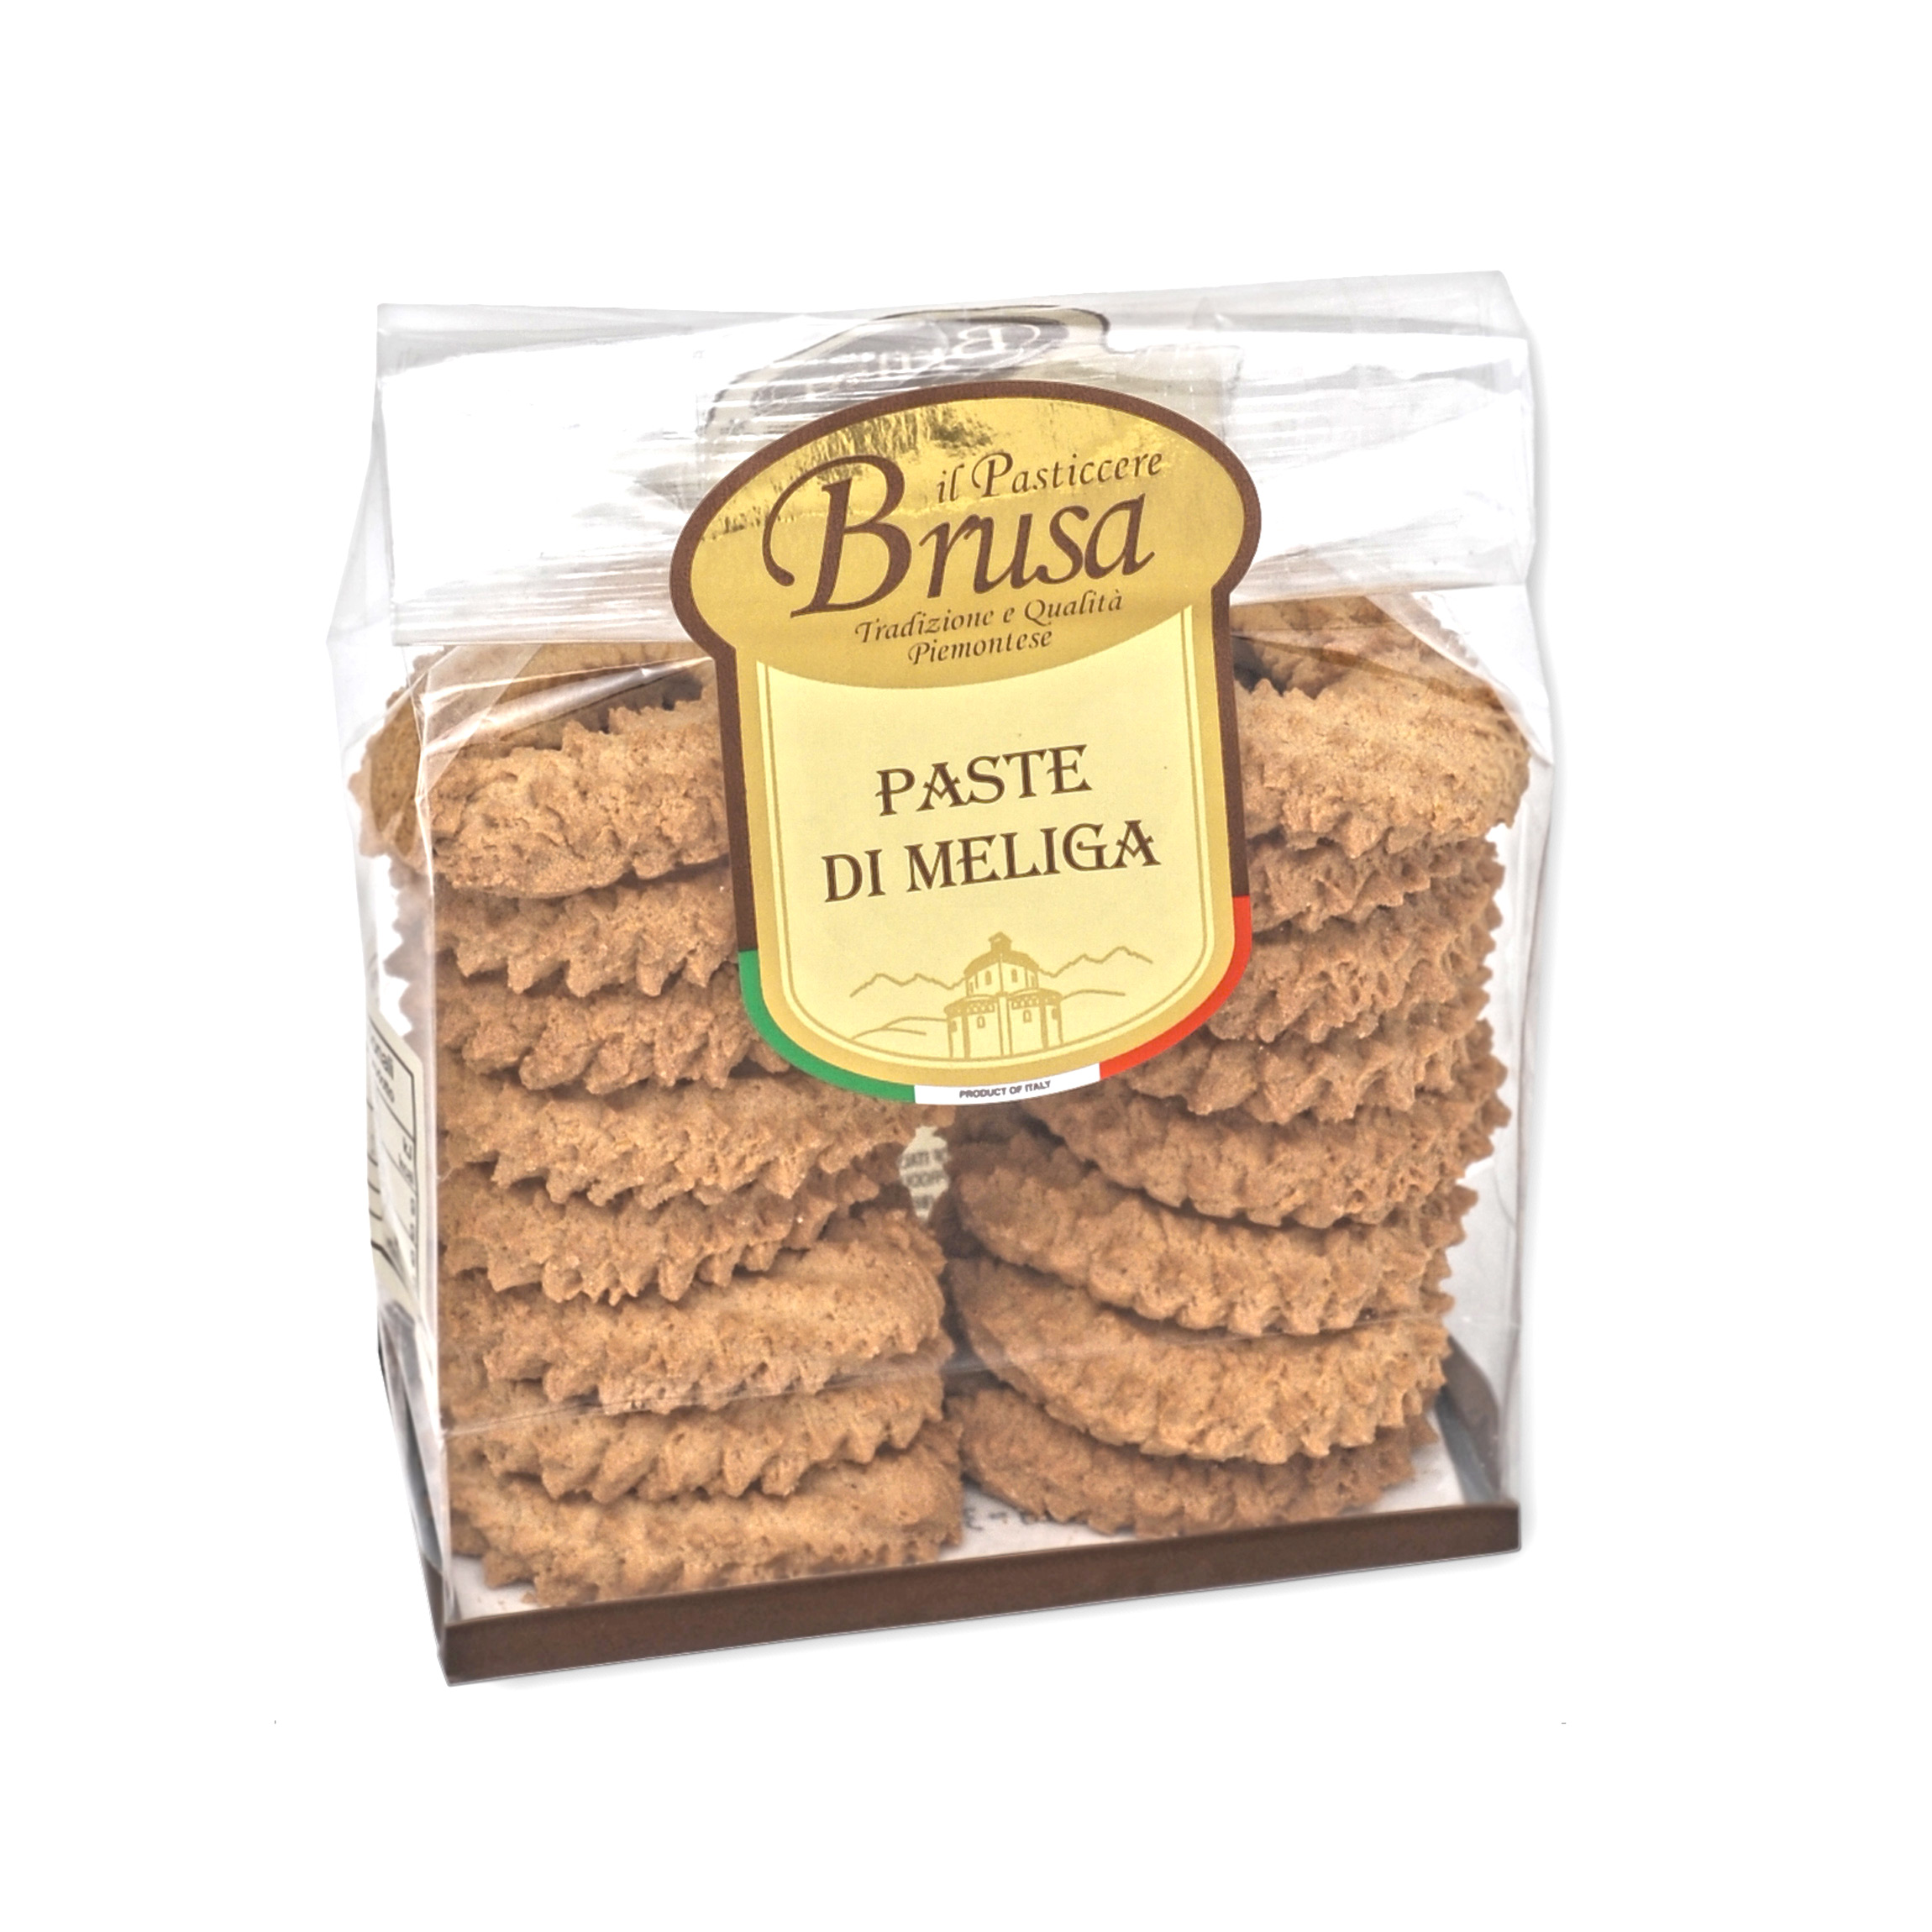 paste-di-meliga-biscuits-300g